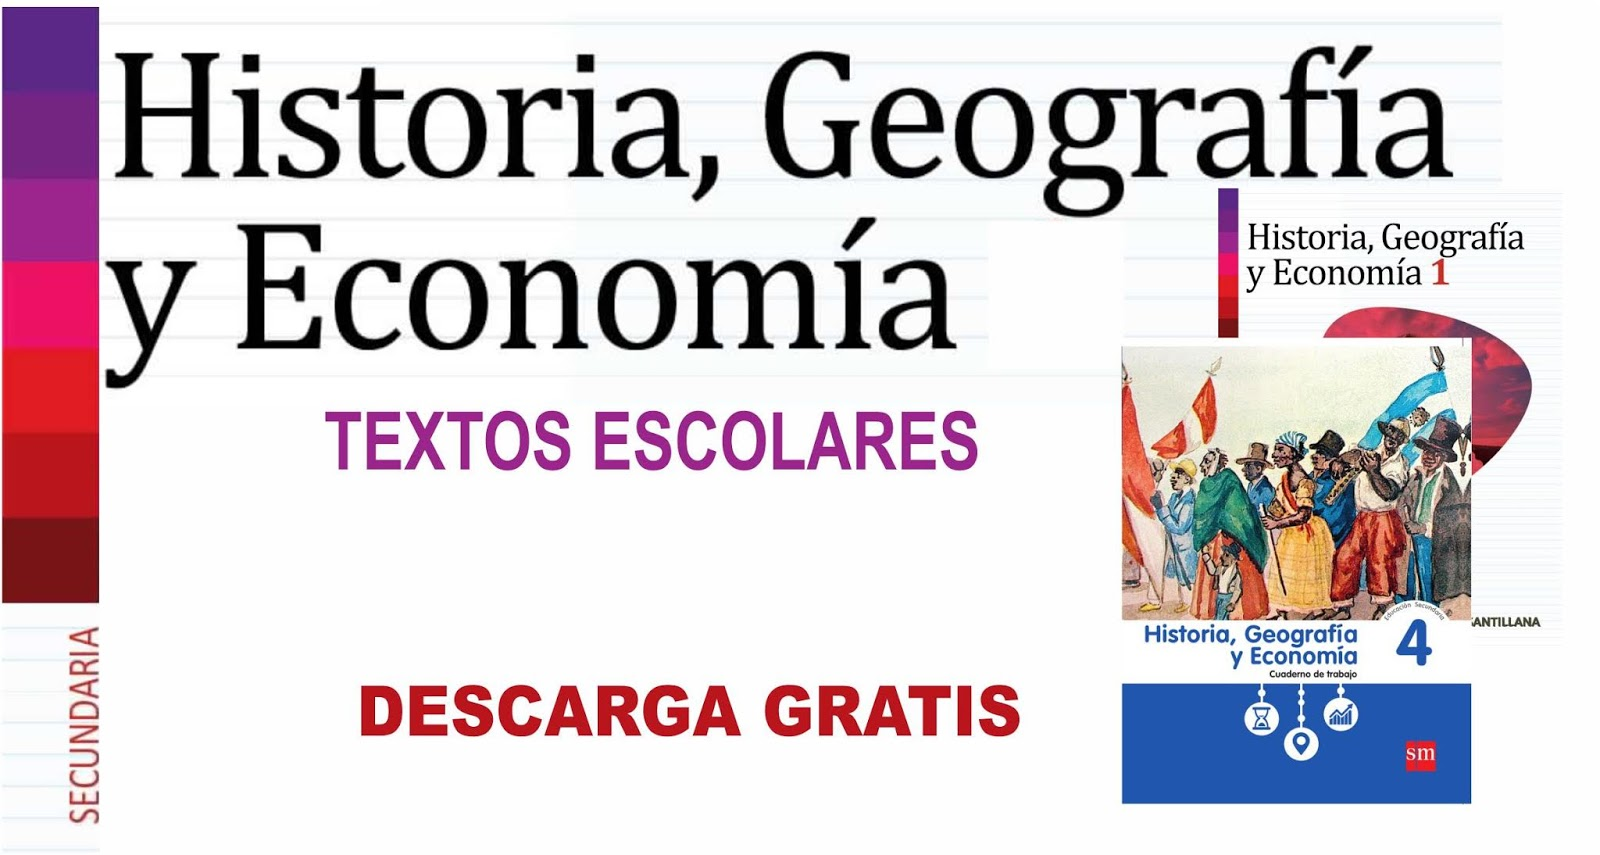 DOCENTES DE LA REGIÓN LIBERTAD